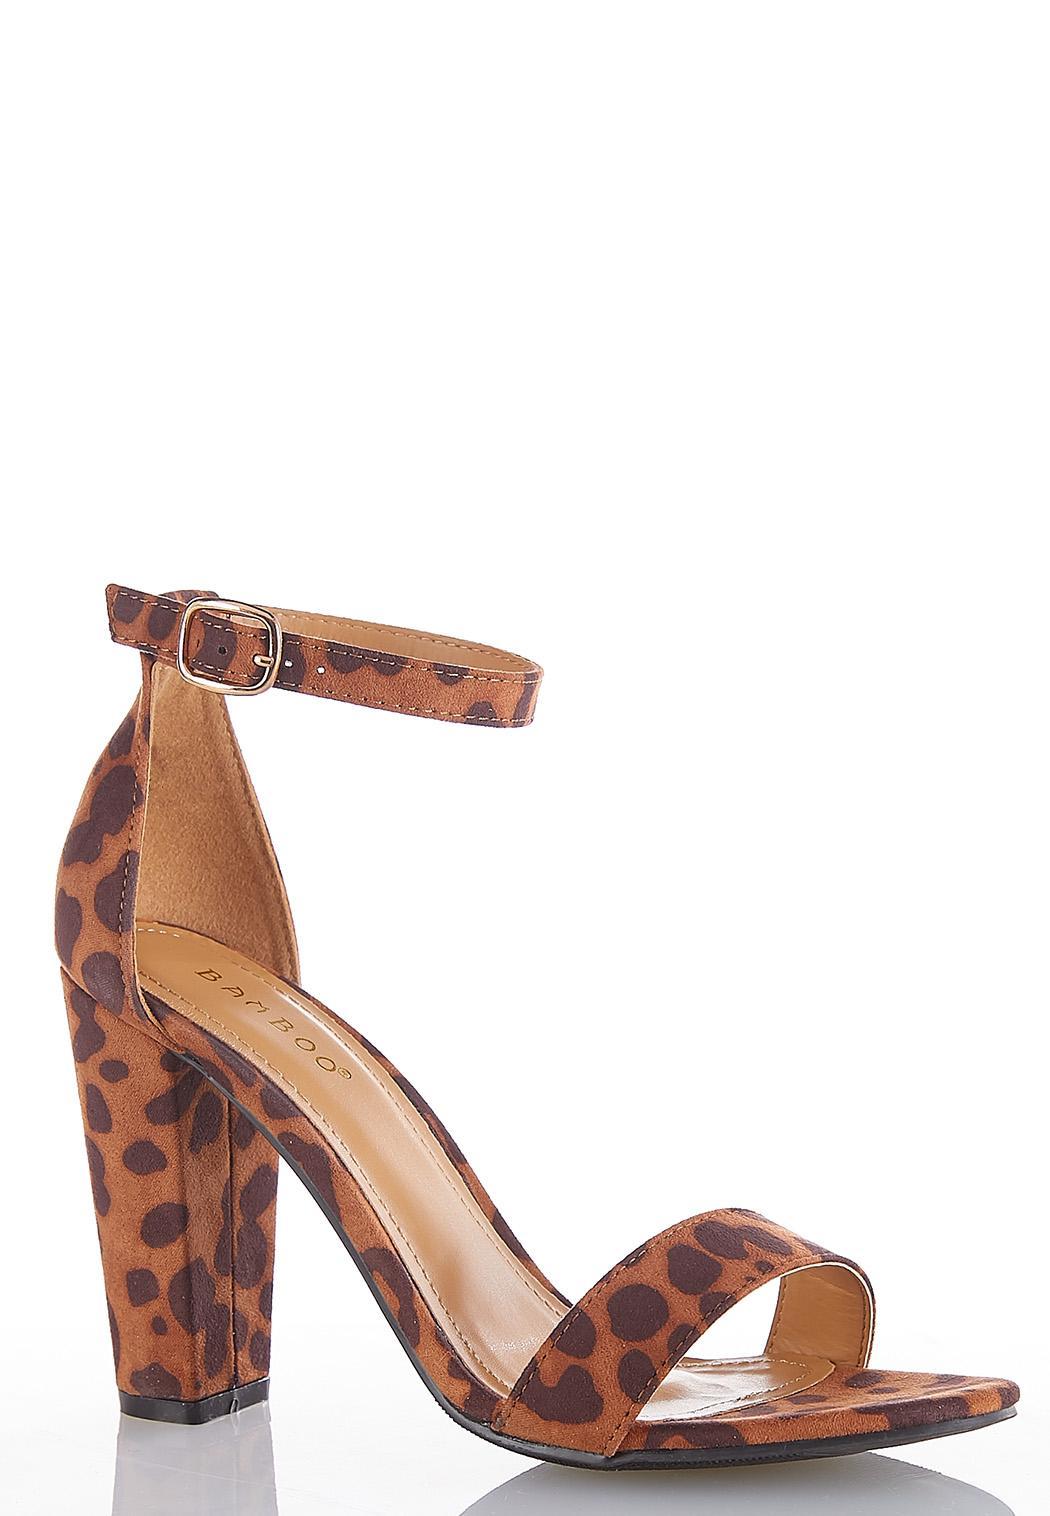 Leopard Ankle Strap Heeled Sandals